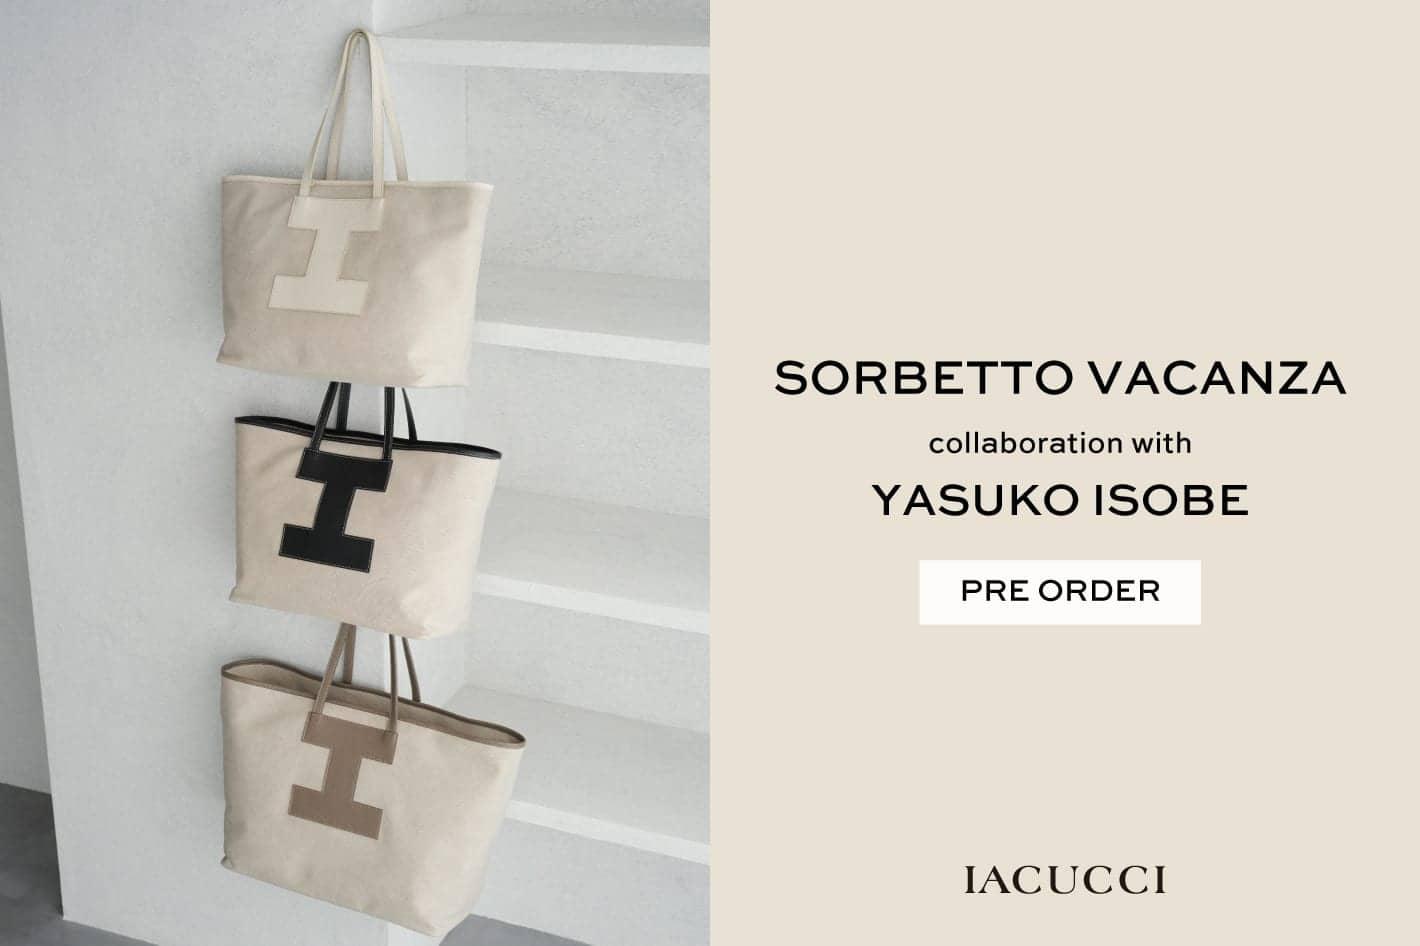 IACUCCI SORBETTO VACANZA debut!